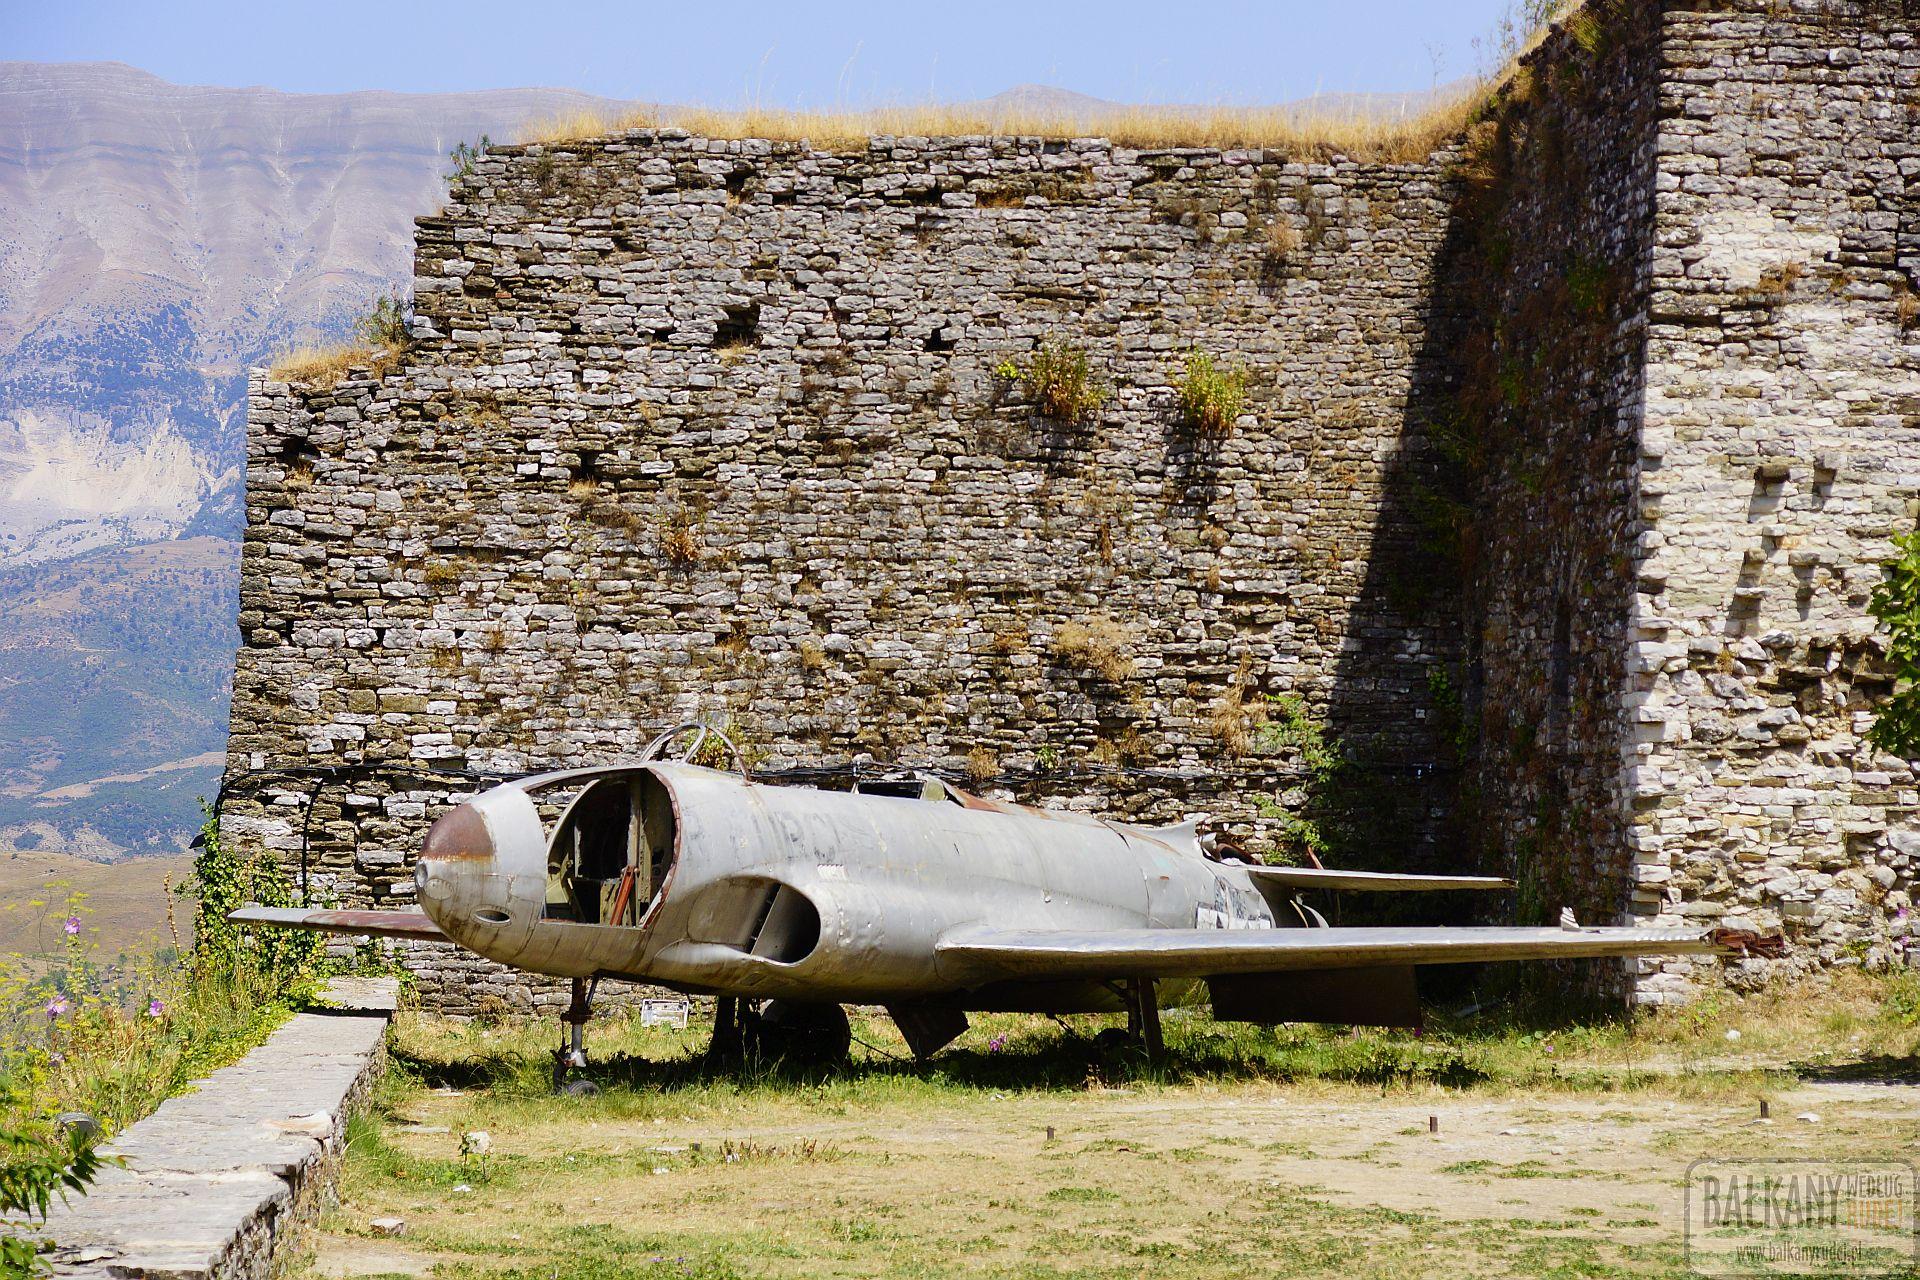 samolot wojskowy Lockheed T-33